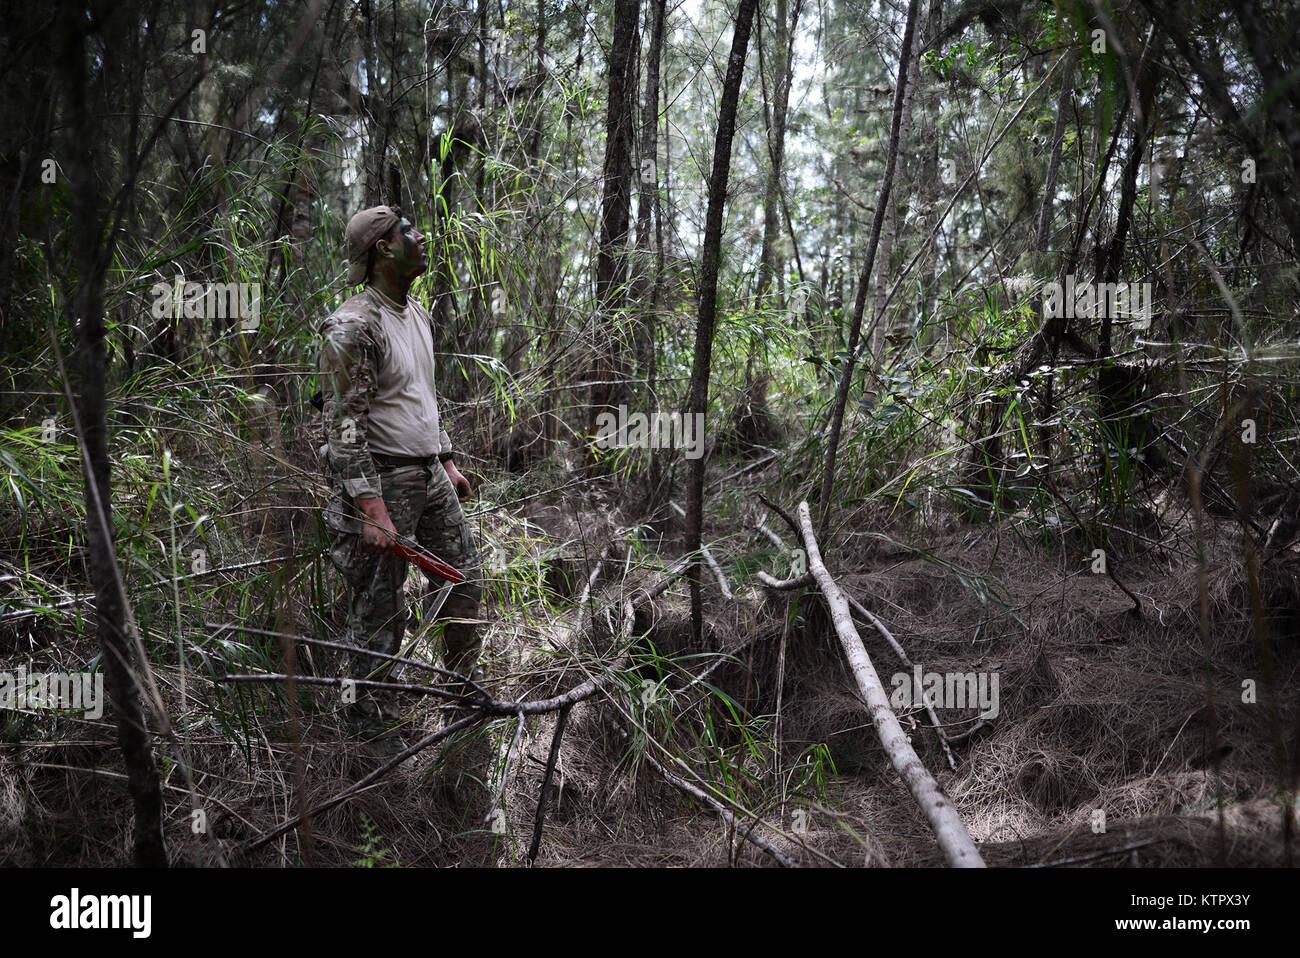 HOMESTEAD AIR RESERVE BASE, FLORIDA - Senior Airman Ian Kuhn, a SERE (Survival, Evasion, Resistance, and Escape) Stock Photo